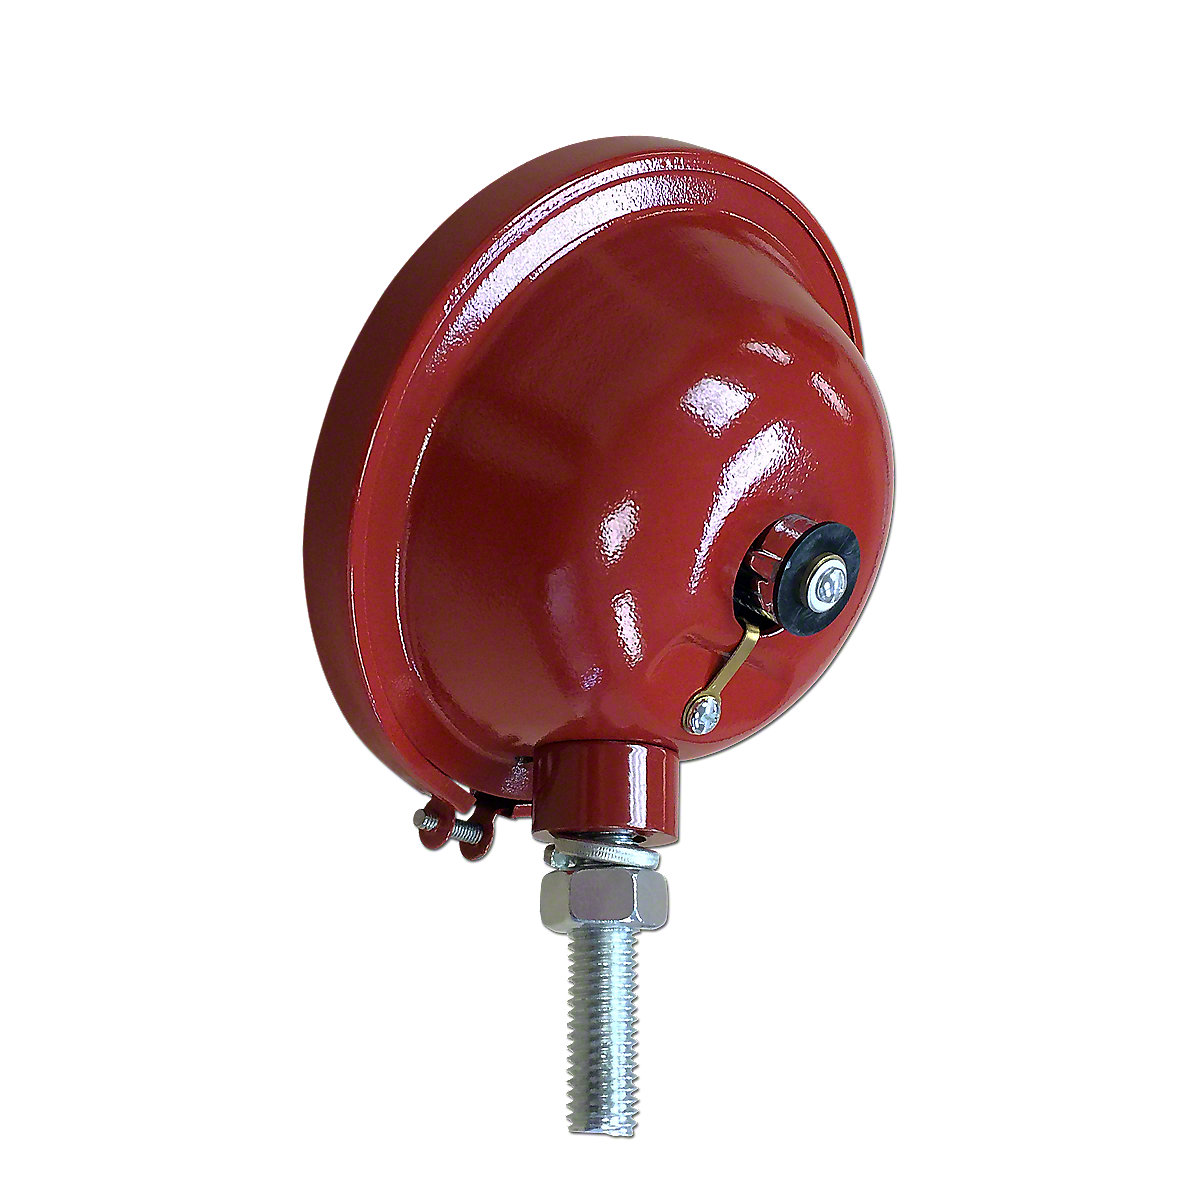 IHS46312 Volt Flat Back Headlight Assembly